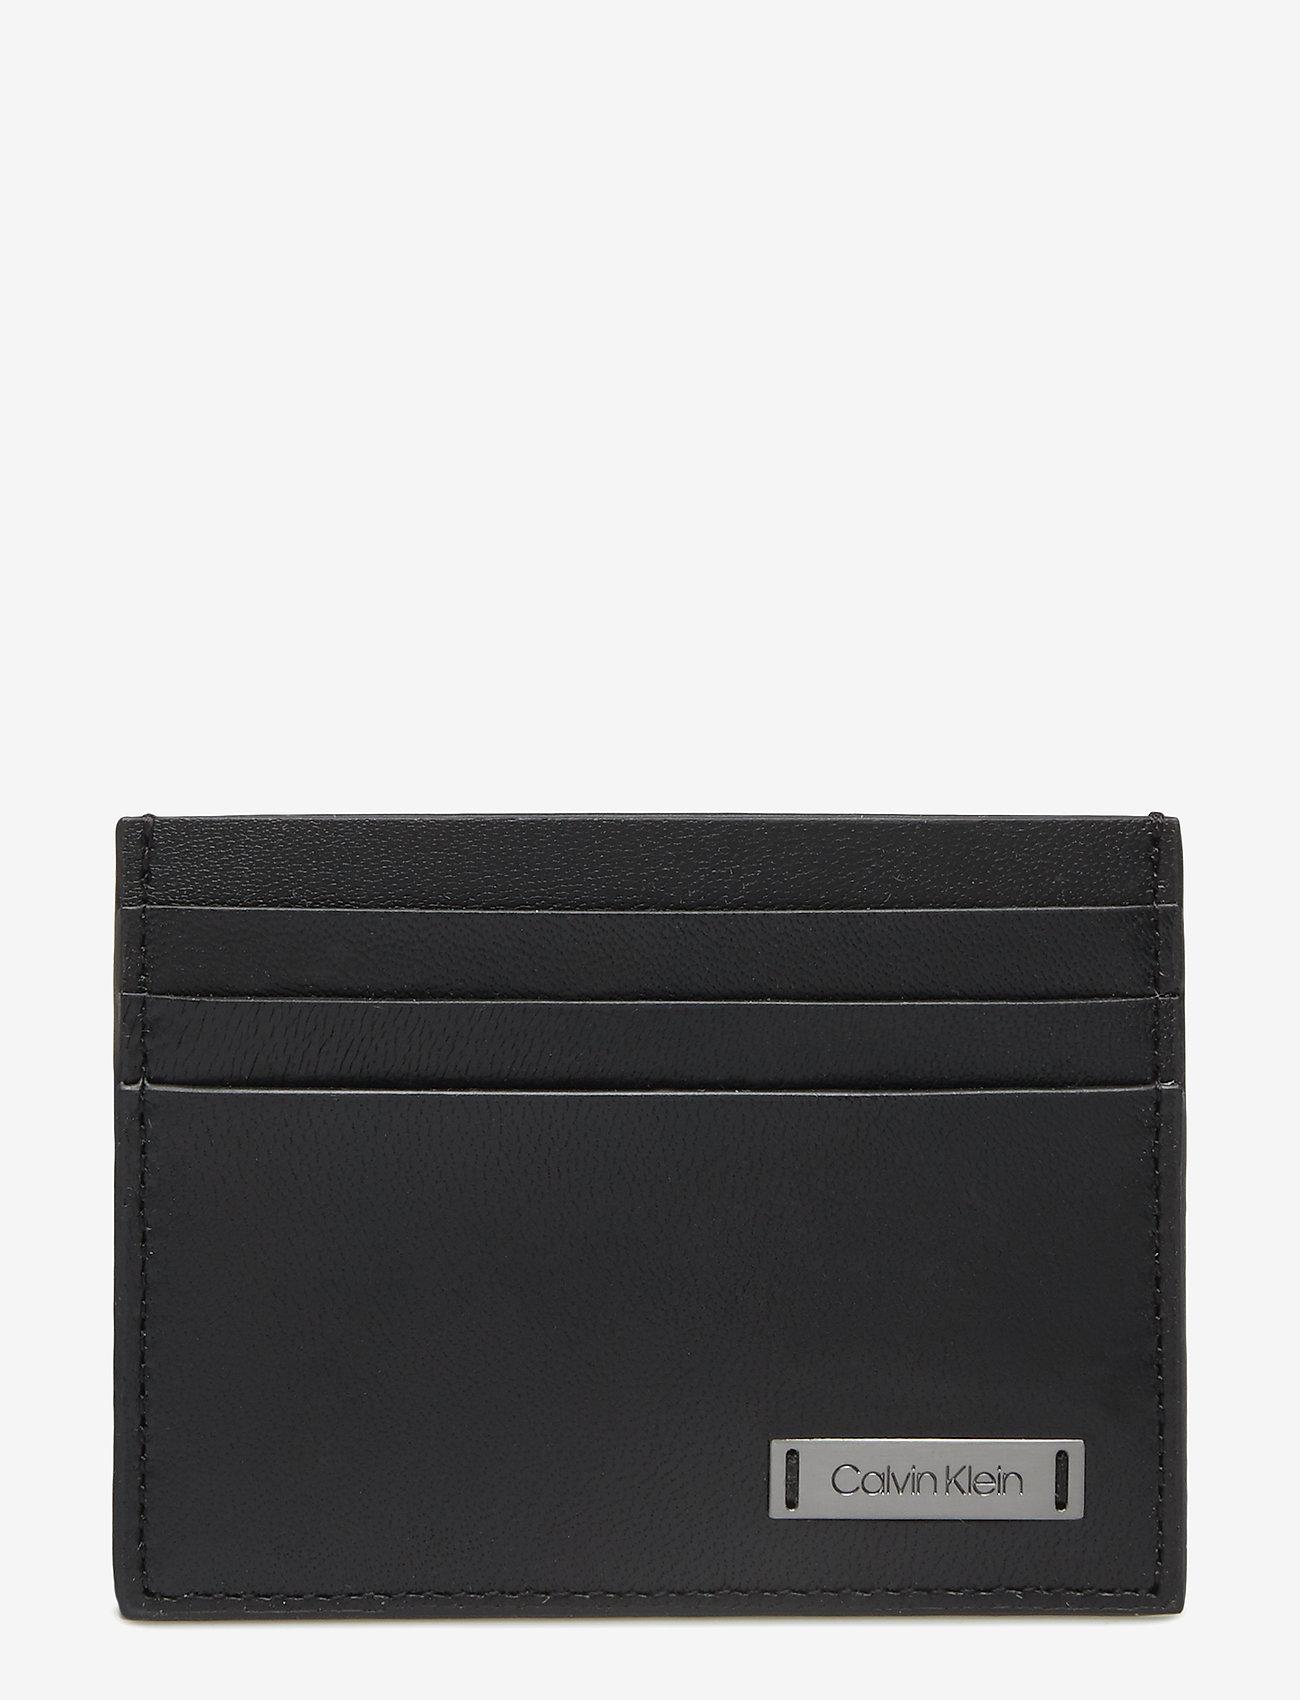 Calvin Klein - SMOOTH W PLAQUE CARDHOLDER - cardholder - black - 0